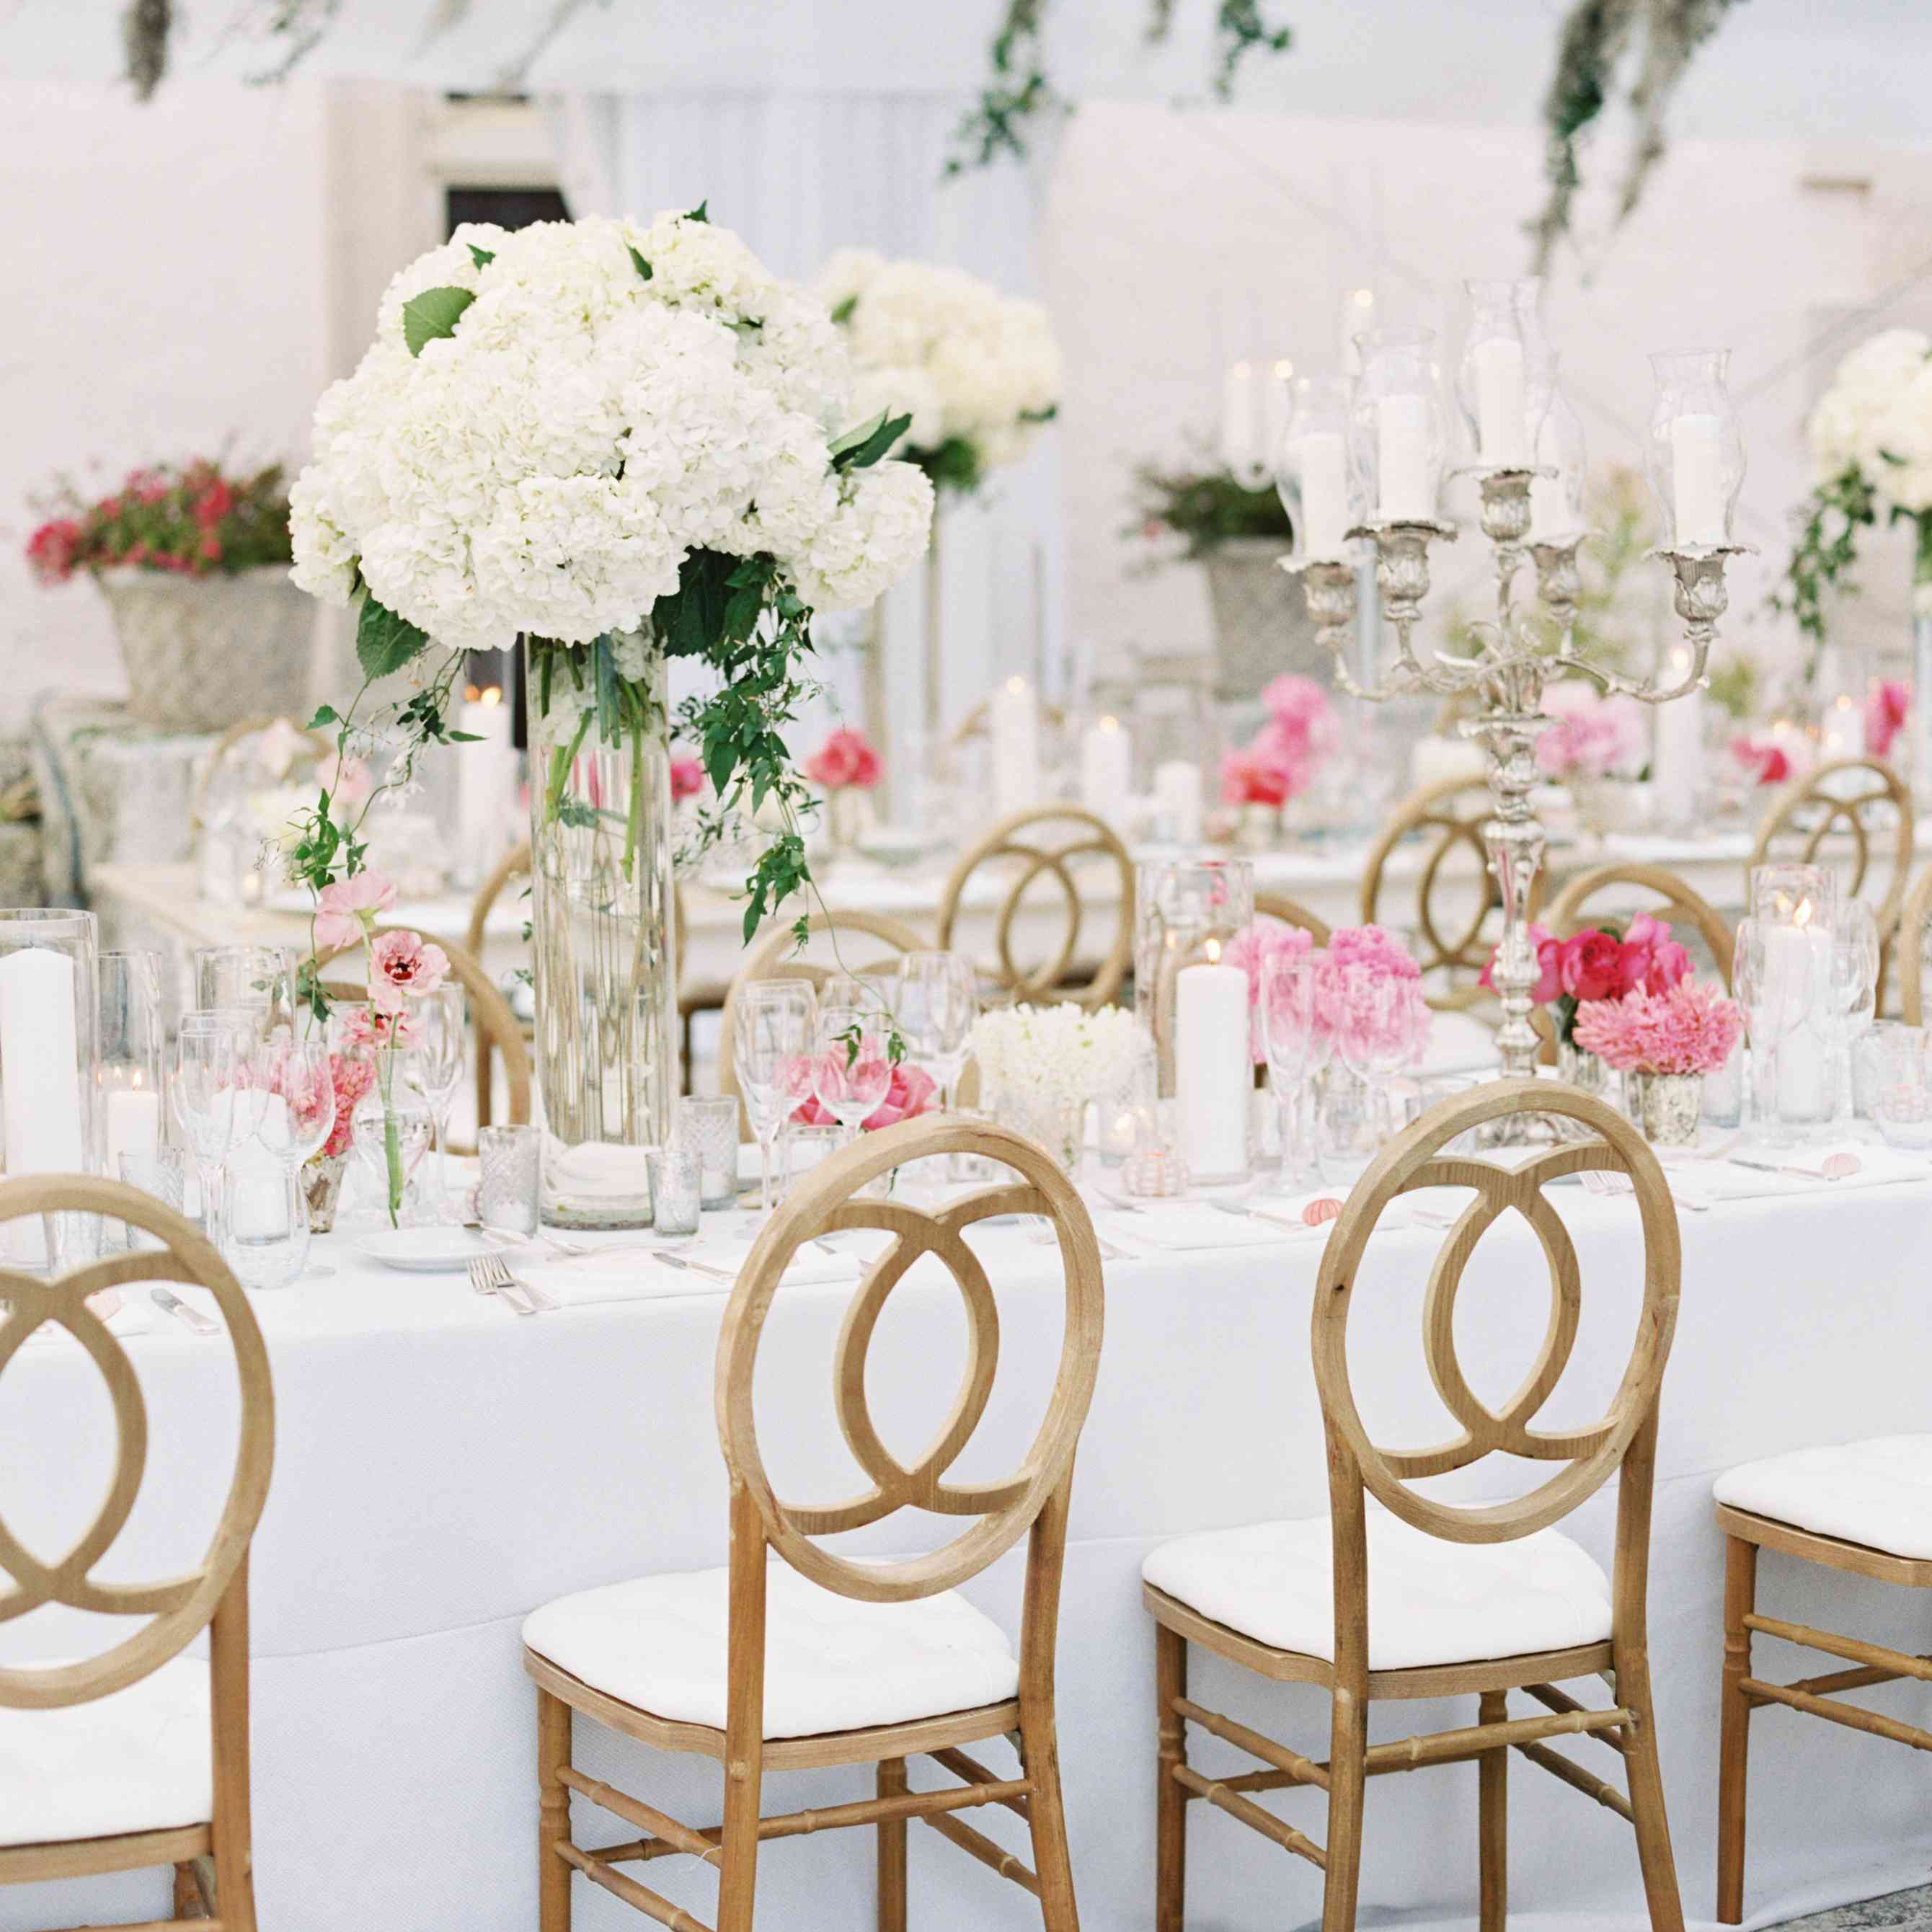 Tall White Flower Centerpieces